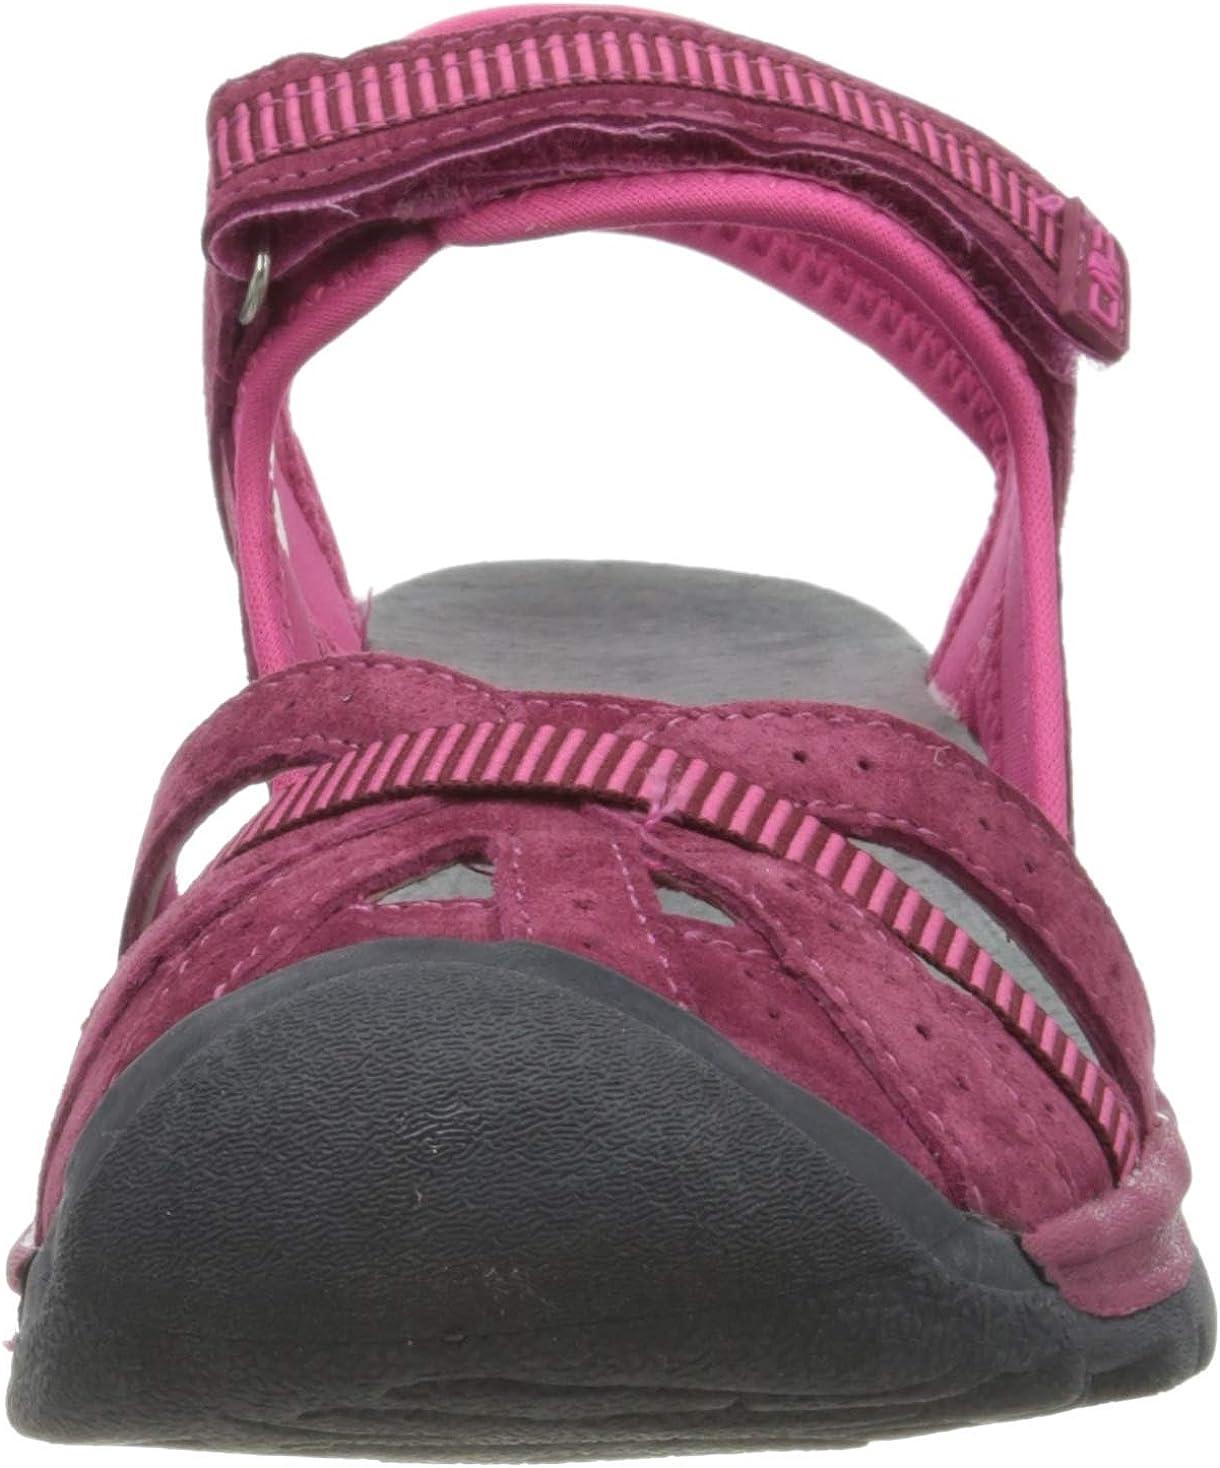 Randonn/ée Femme CMP F.lli Campagnolo Hezie WMN Hiking Sandal